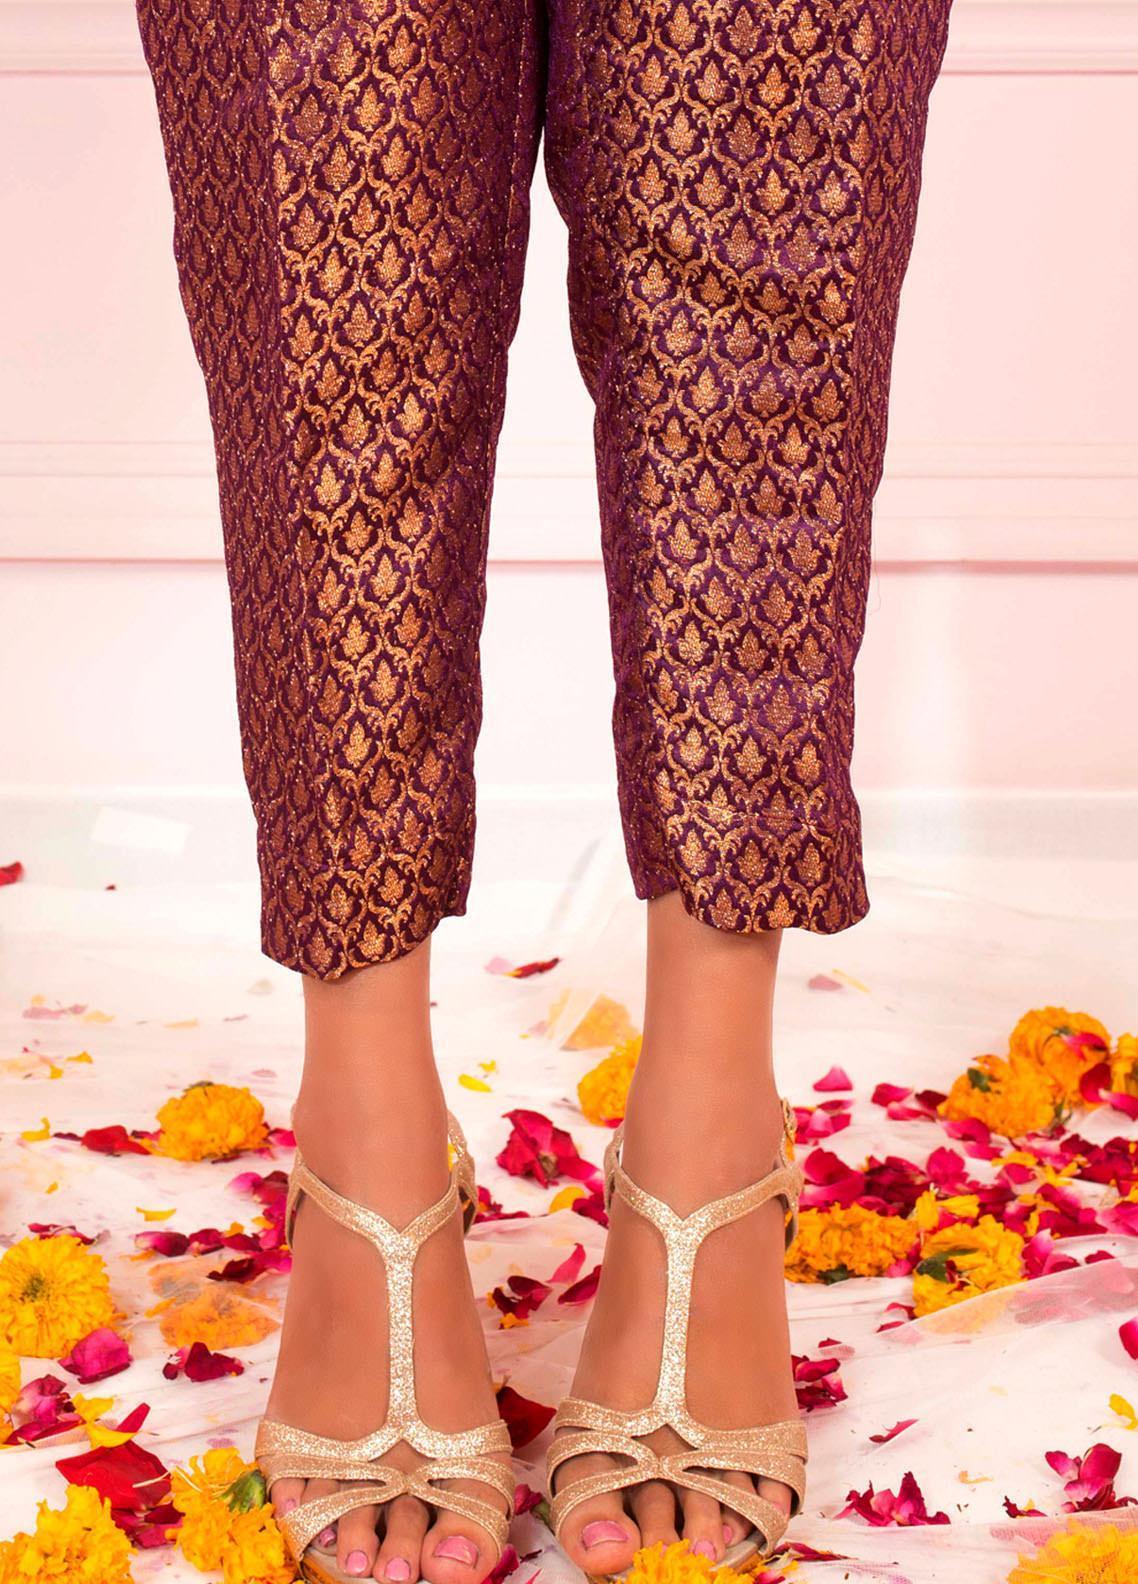 Zaaviay Fancy Banarsi Stitched Trousers ZSC-031 PLUM BANARSI STRAIGHT PANTS